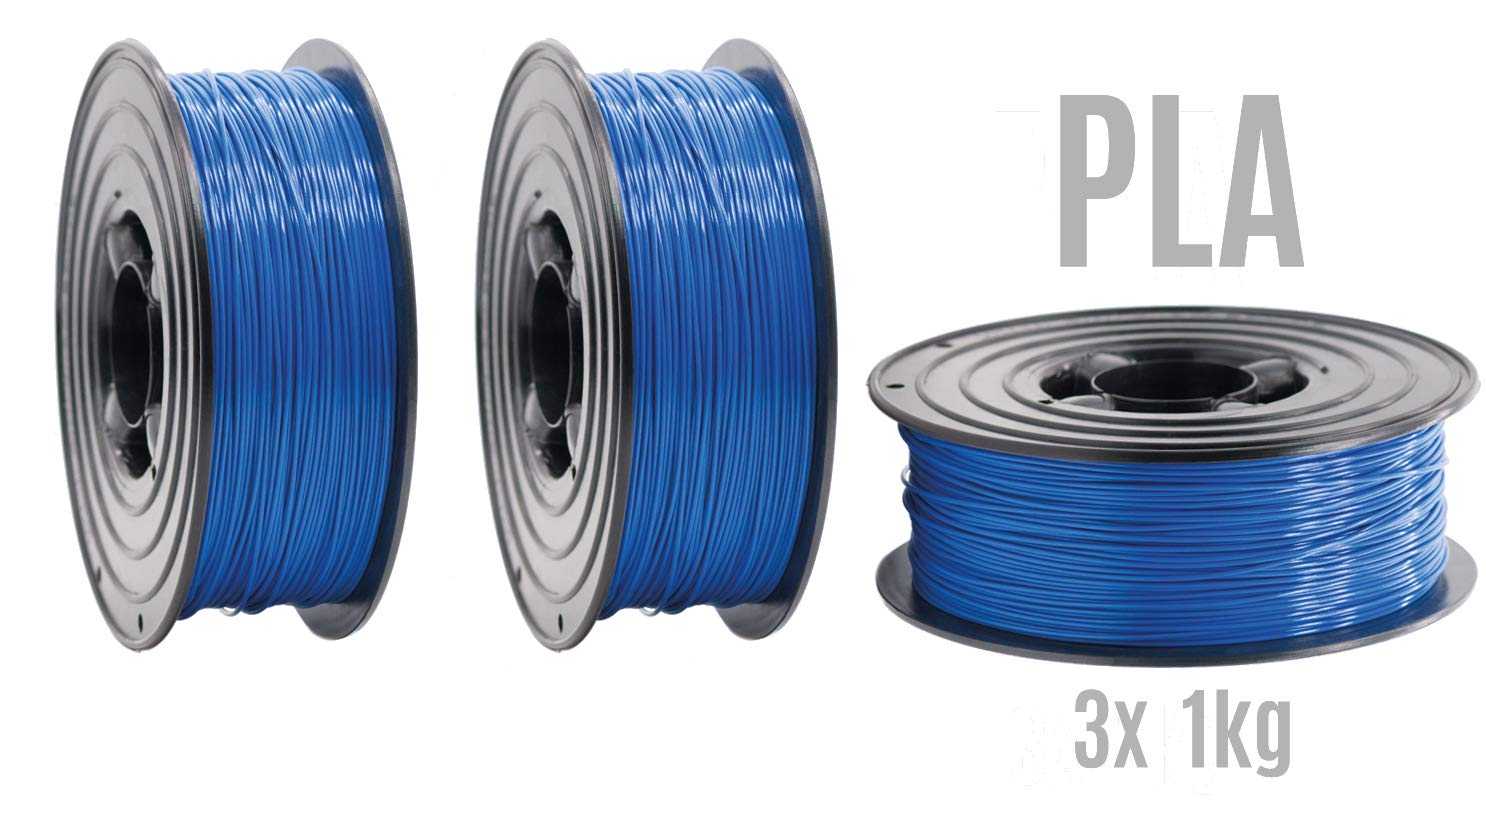 Filamento PLA para impresora 3D, 1,75 mm, 3 rollos de 1 kg, color ...